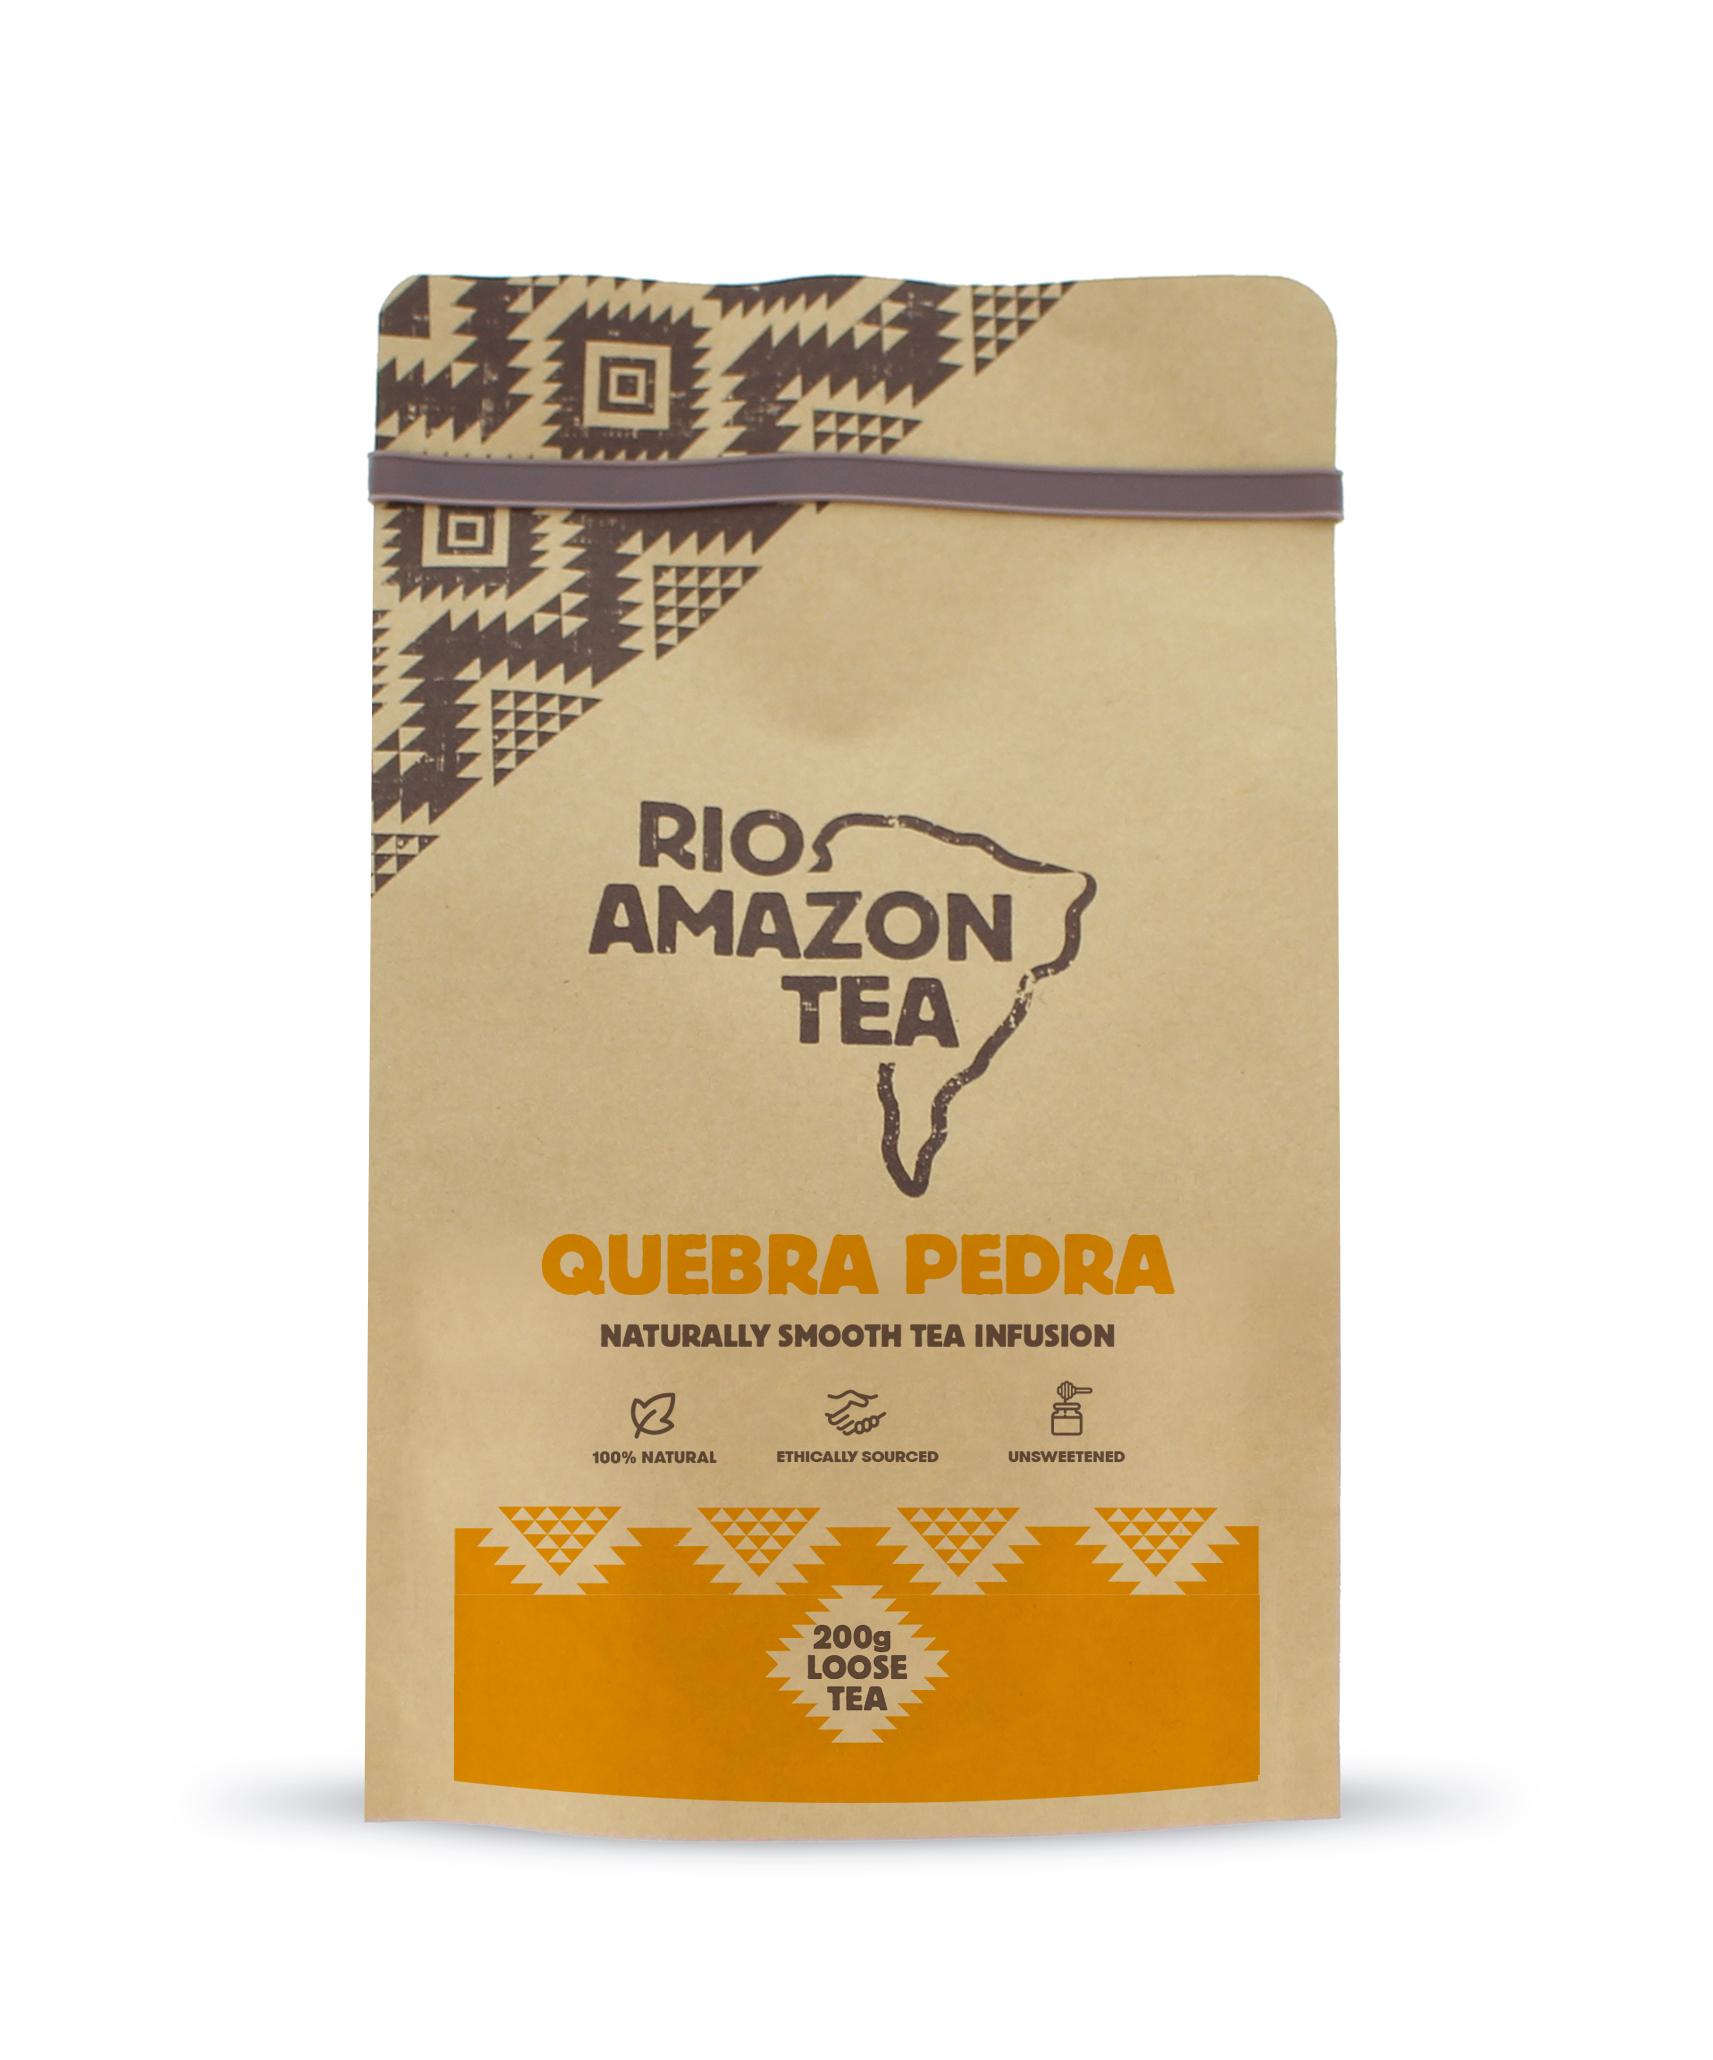 Quebra Pedra Loose Tea 200g